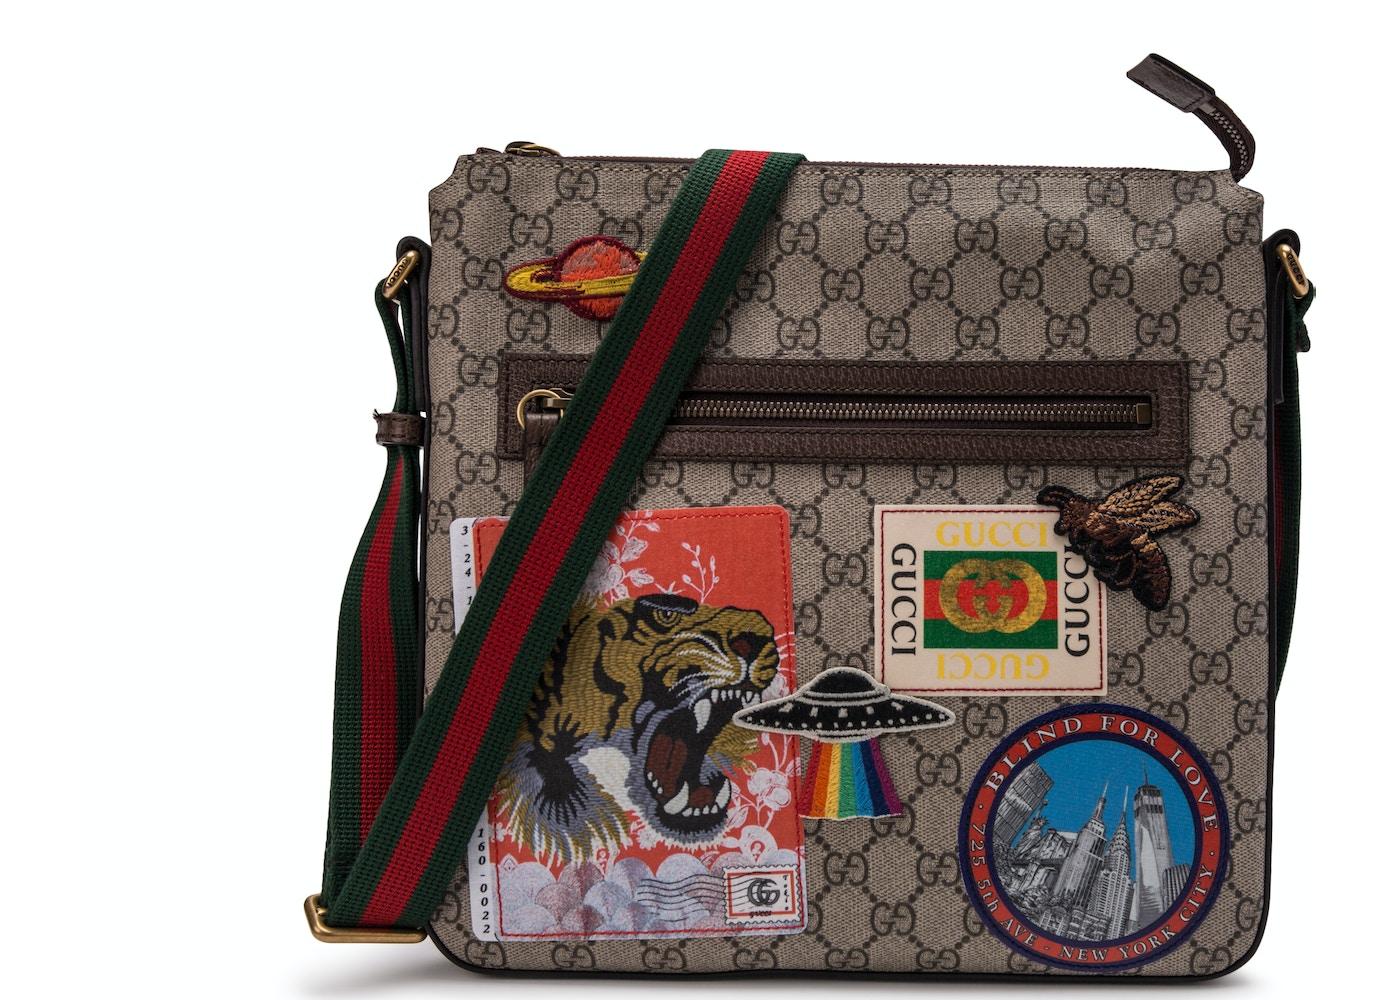 06f6104a7d8 Gucci Courrier Messenger GG Supreme Brown. GG Supreme Brown